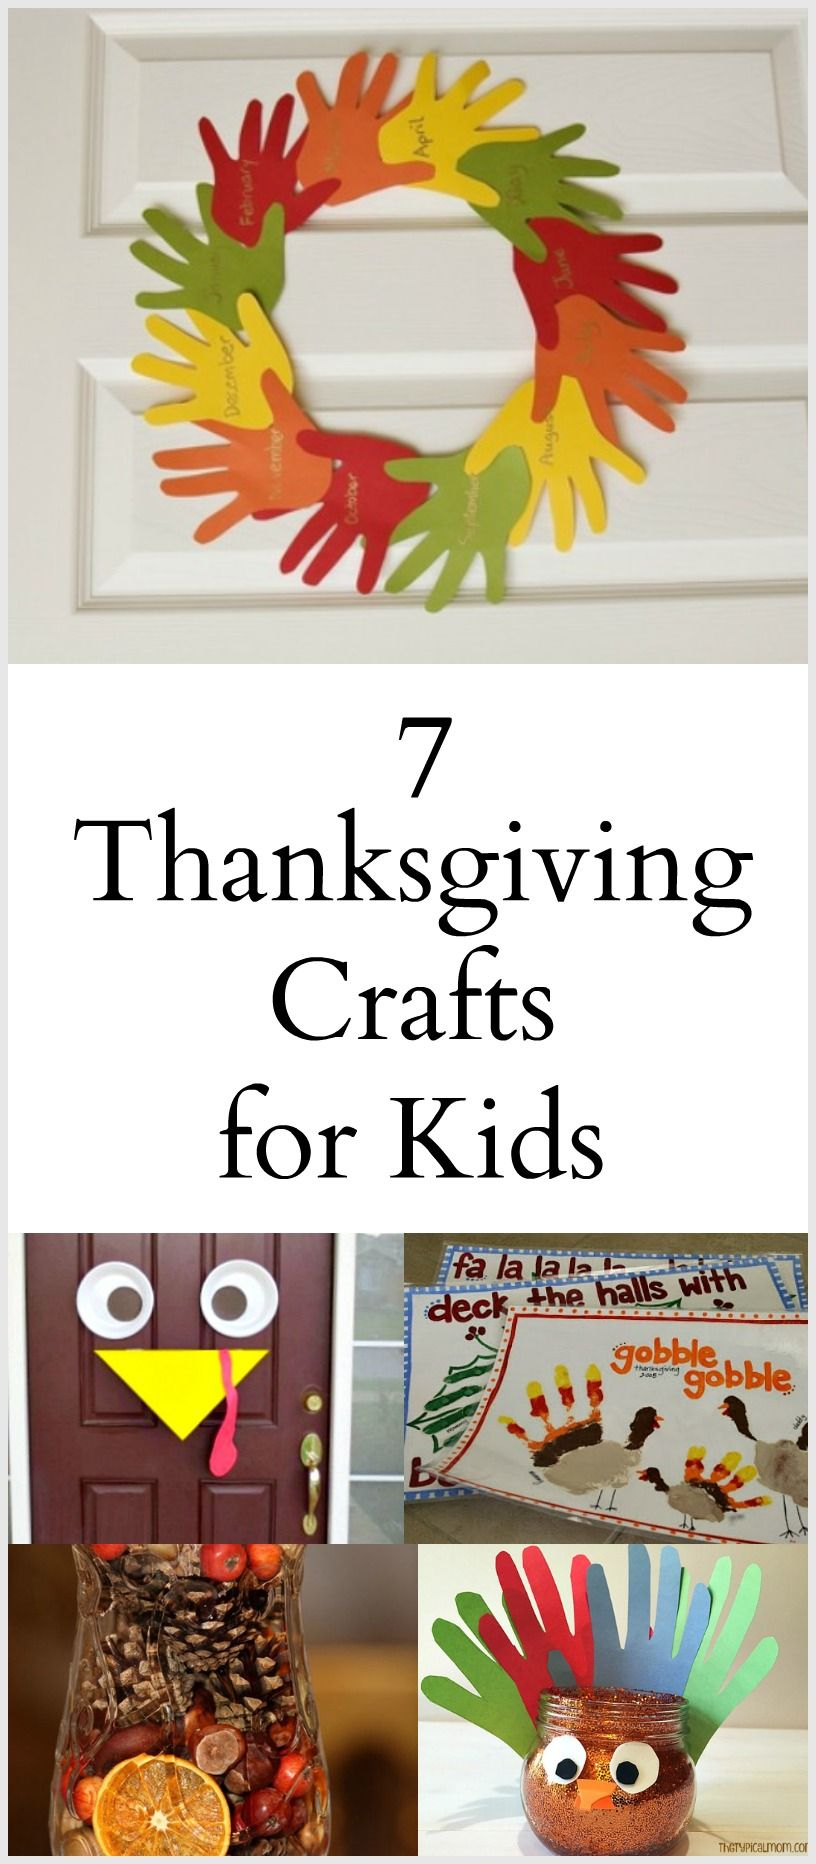 7 Thanksgiving Crafts - The Write Balance